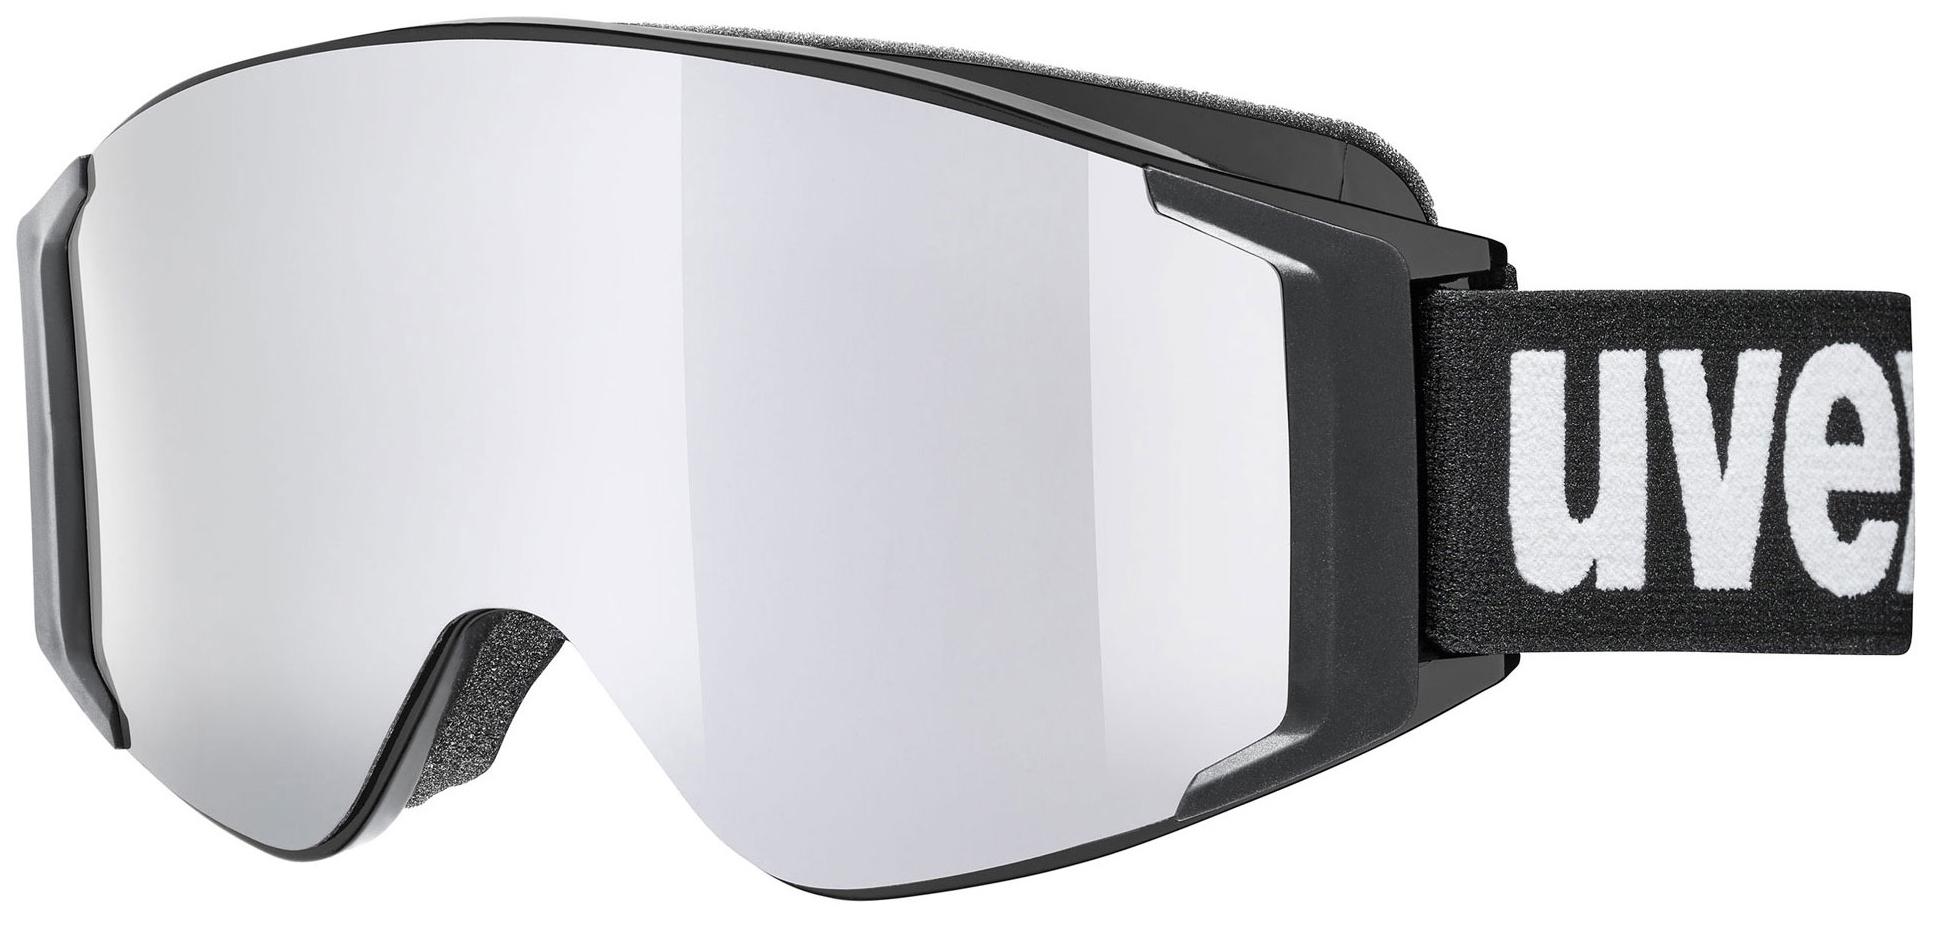 Uvex G.GL 3000 TOP Black 2030